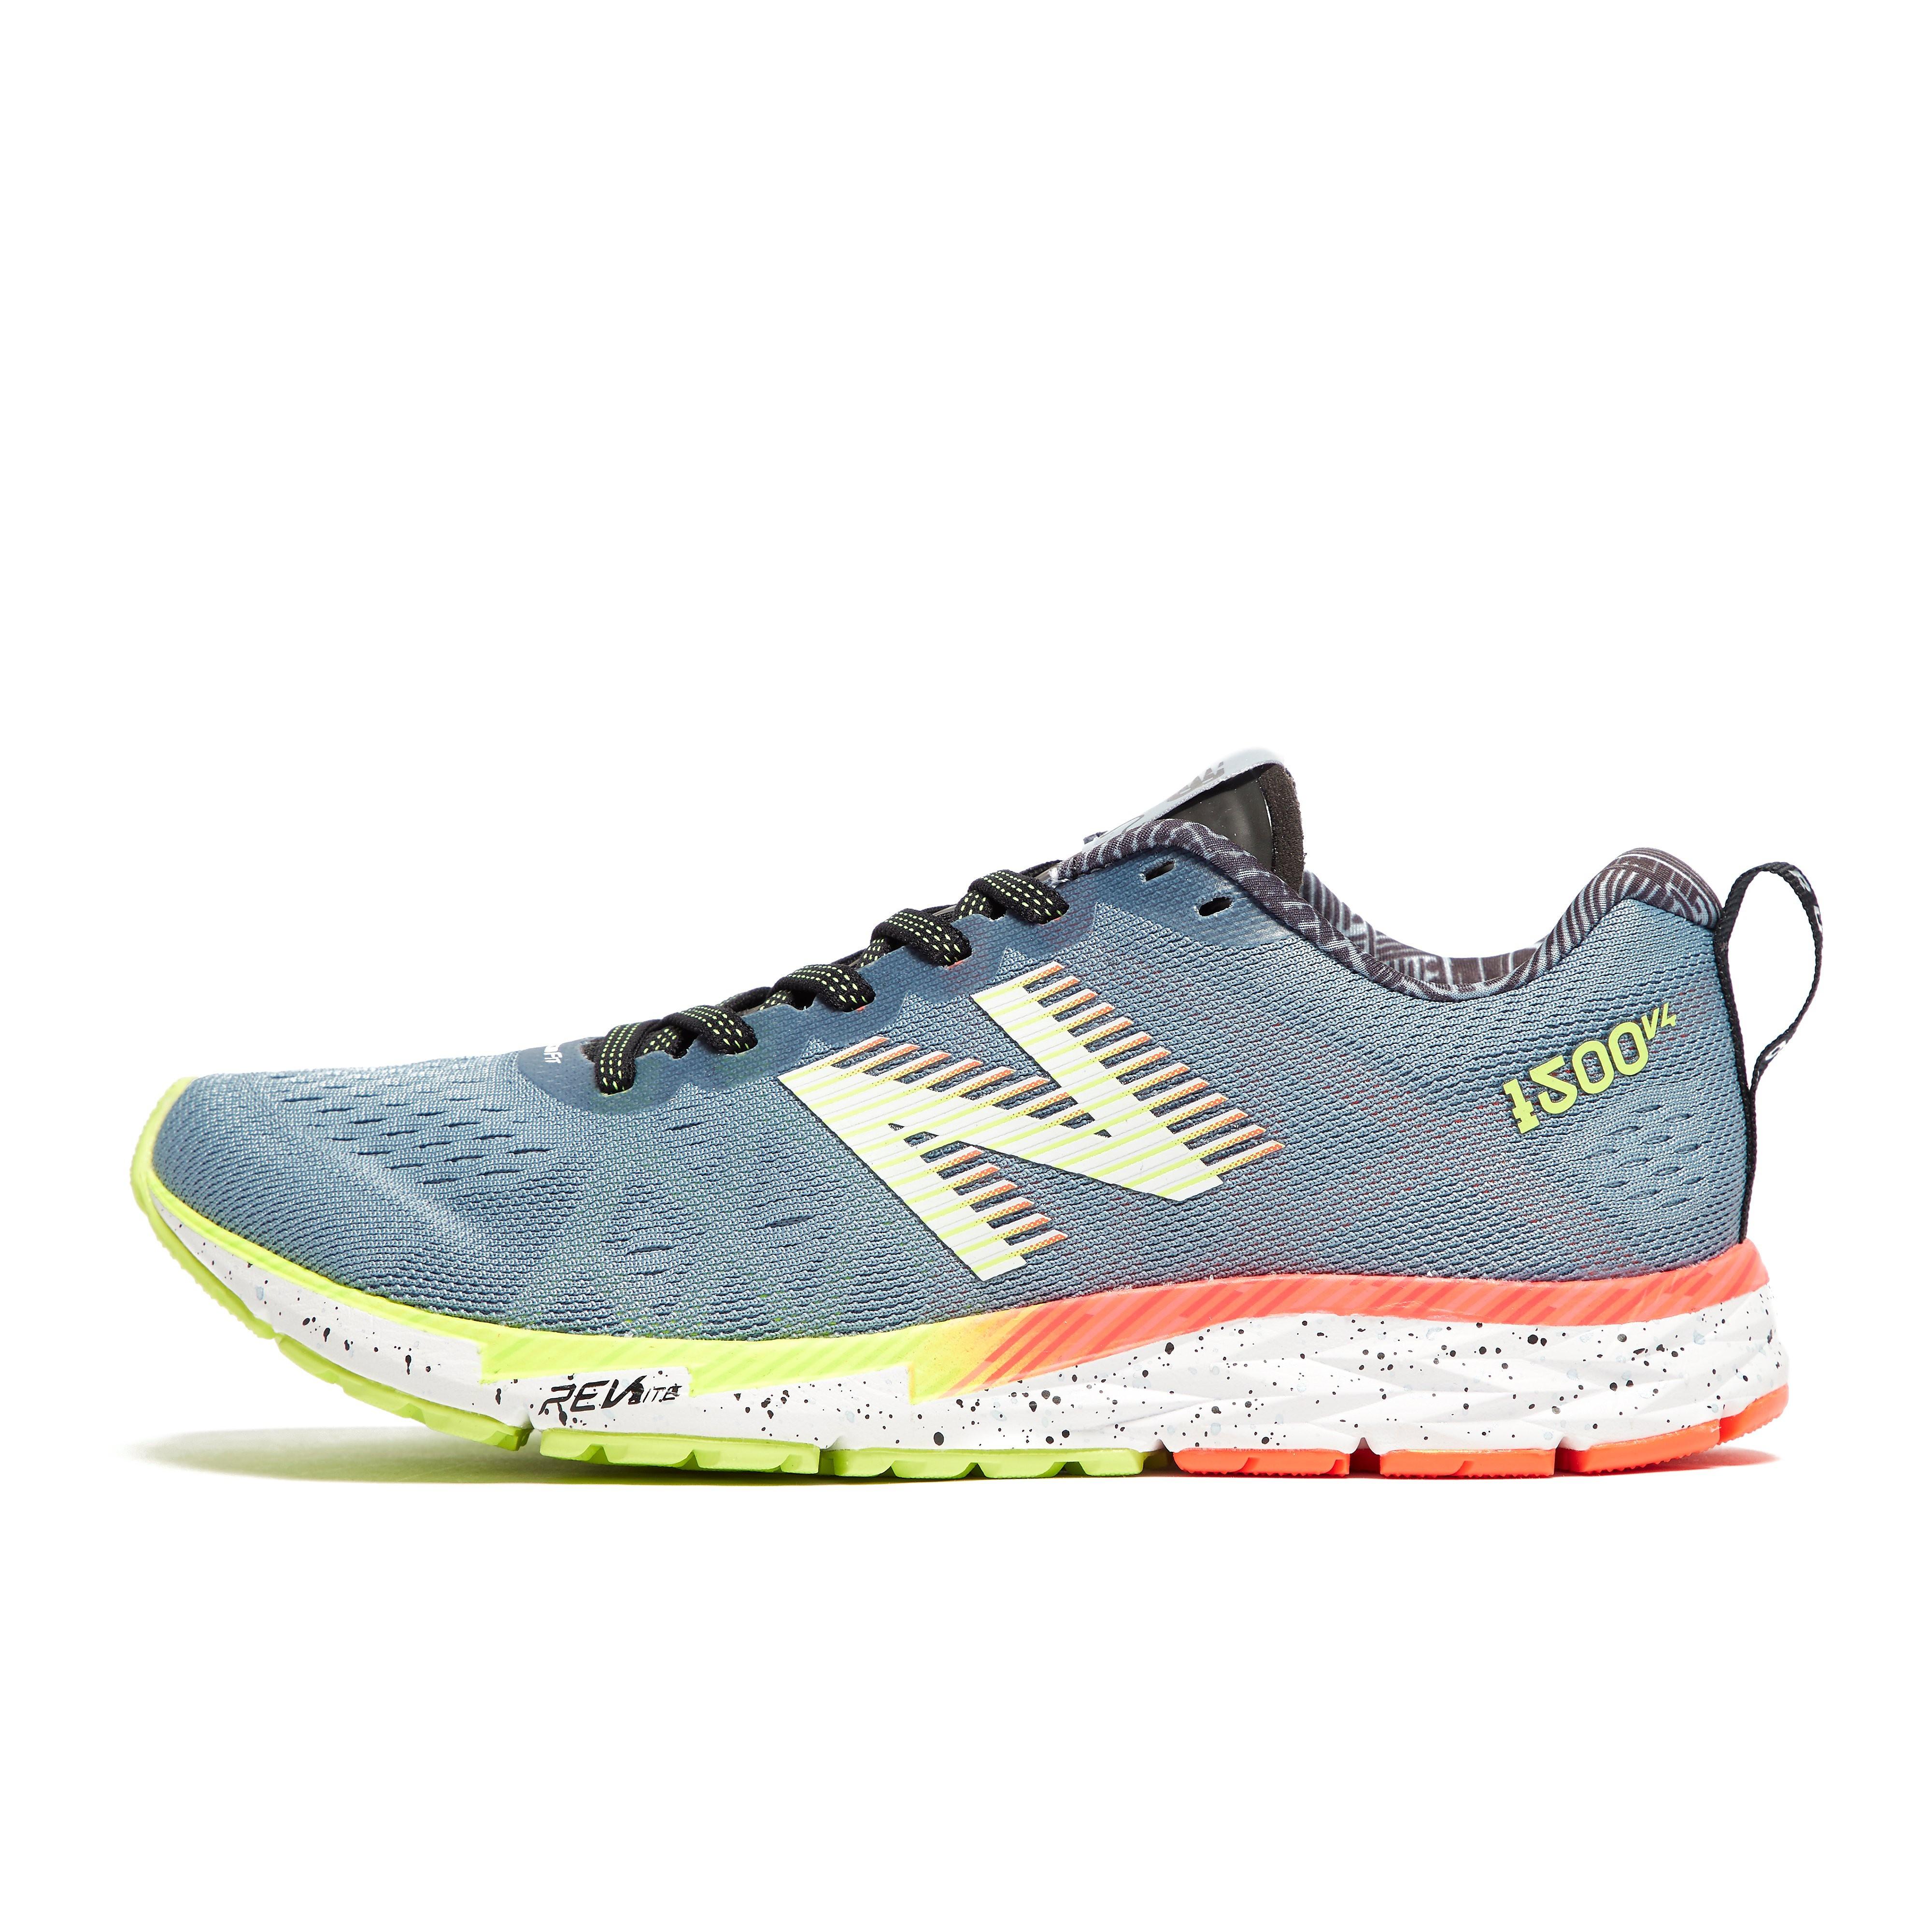 New Balance 1500V4 London Marathon Edition Women's Running Shoes